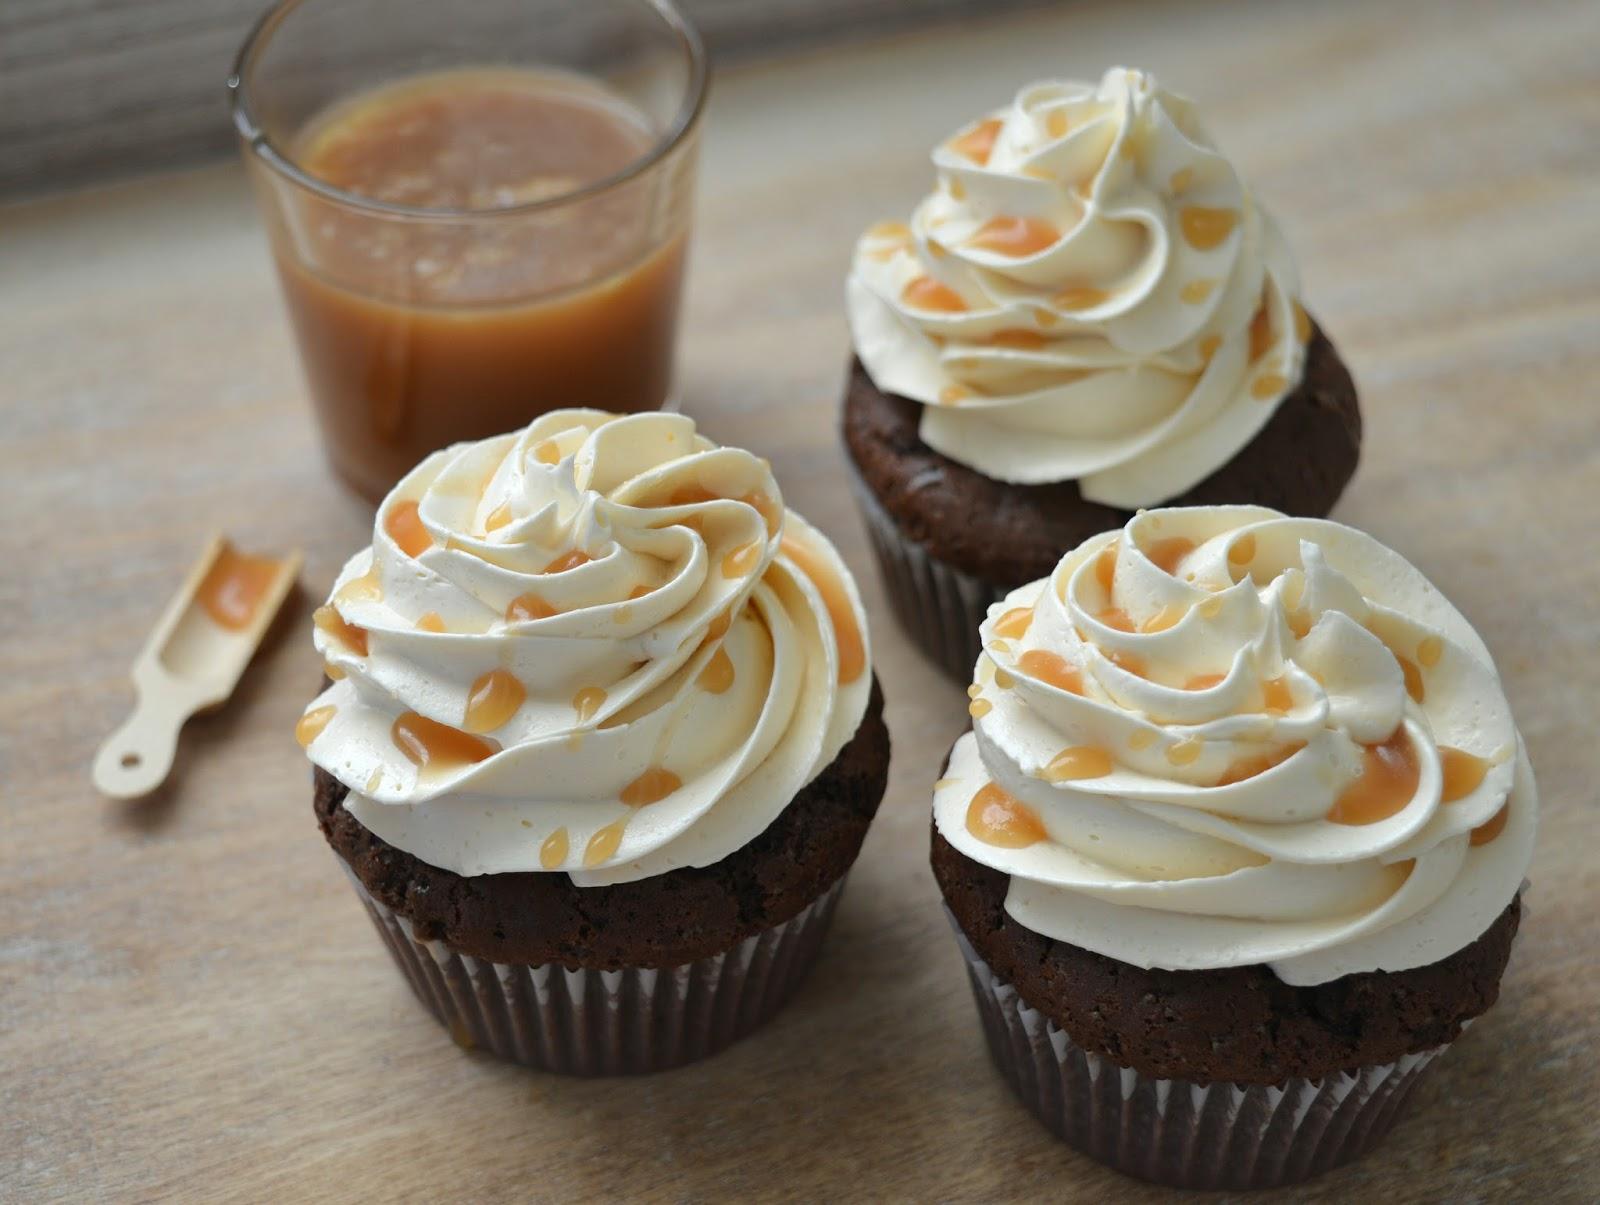 botercreme voor cupcakes